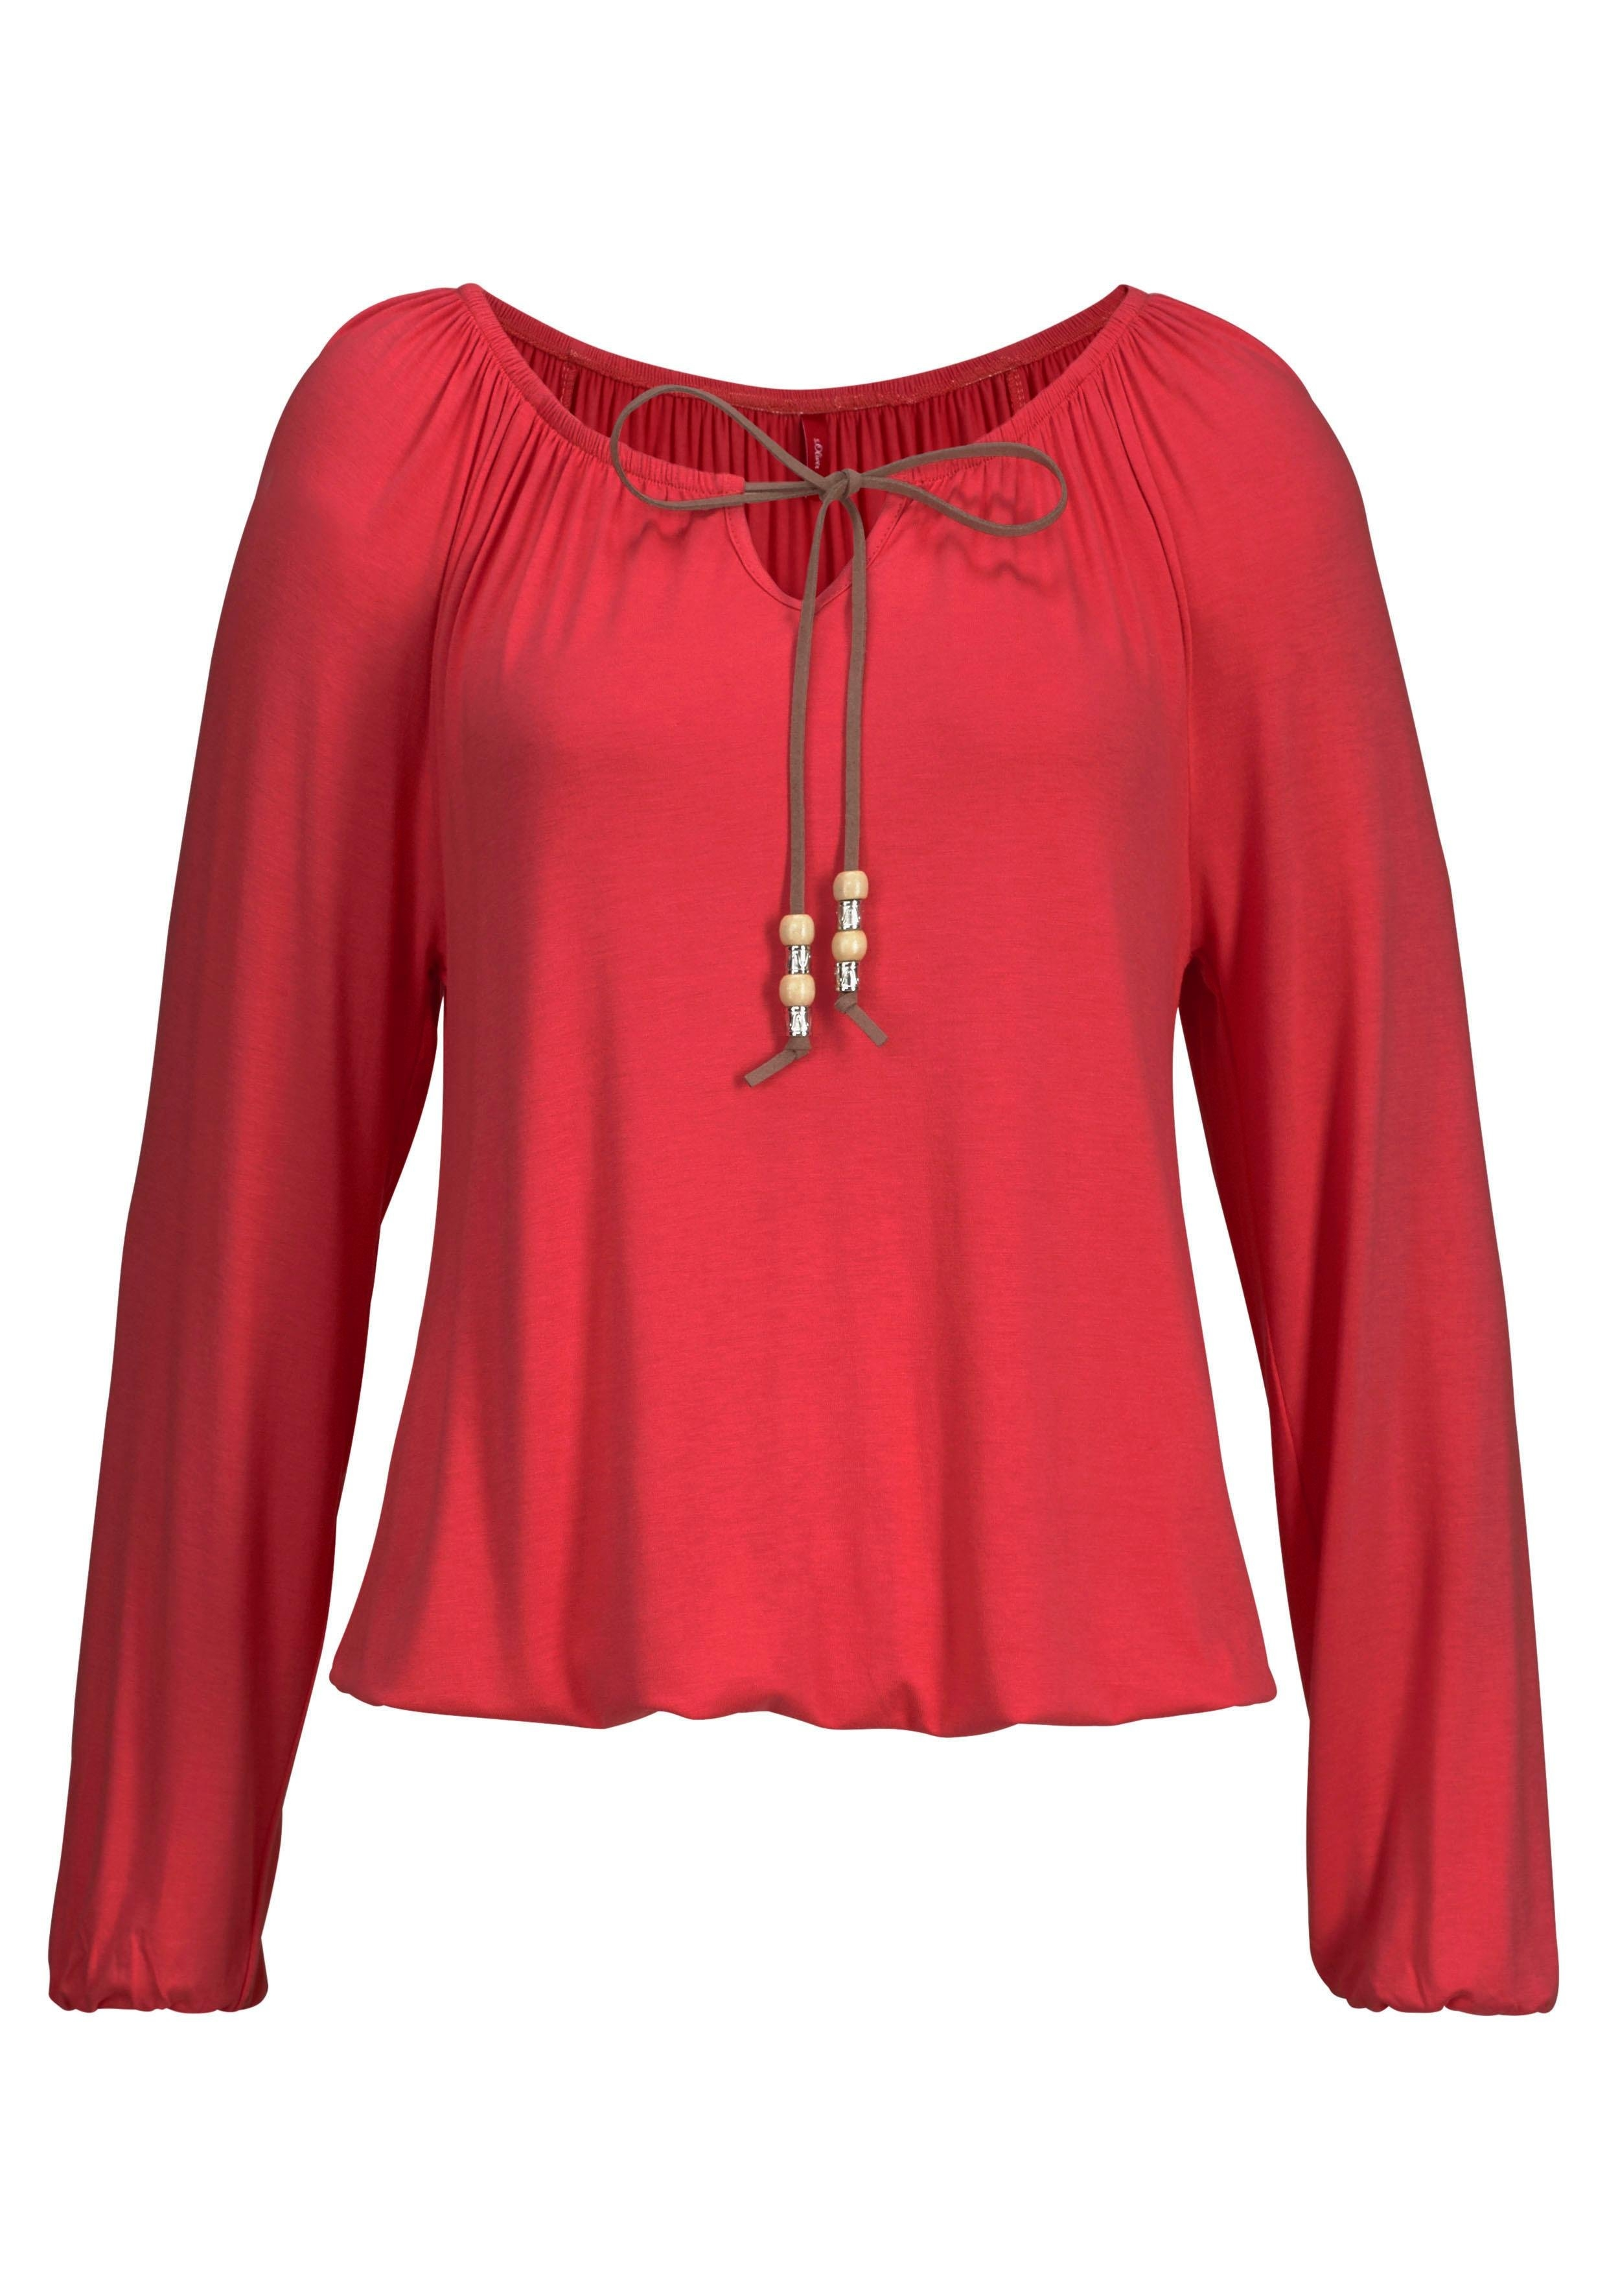 S.OLIVER RED LABEL beachwear strandshirt in de webshop van Lascana kopen